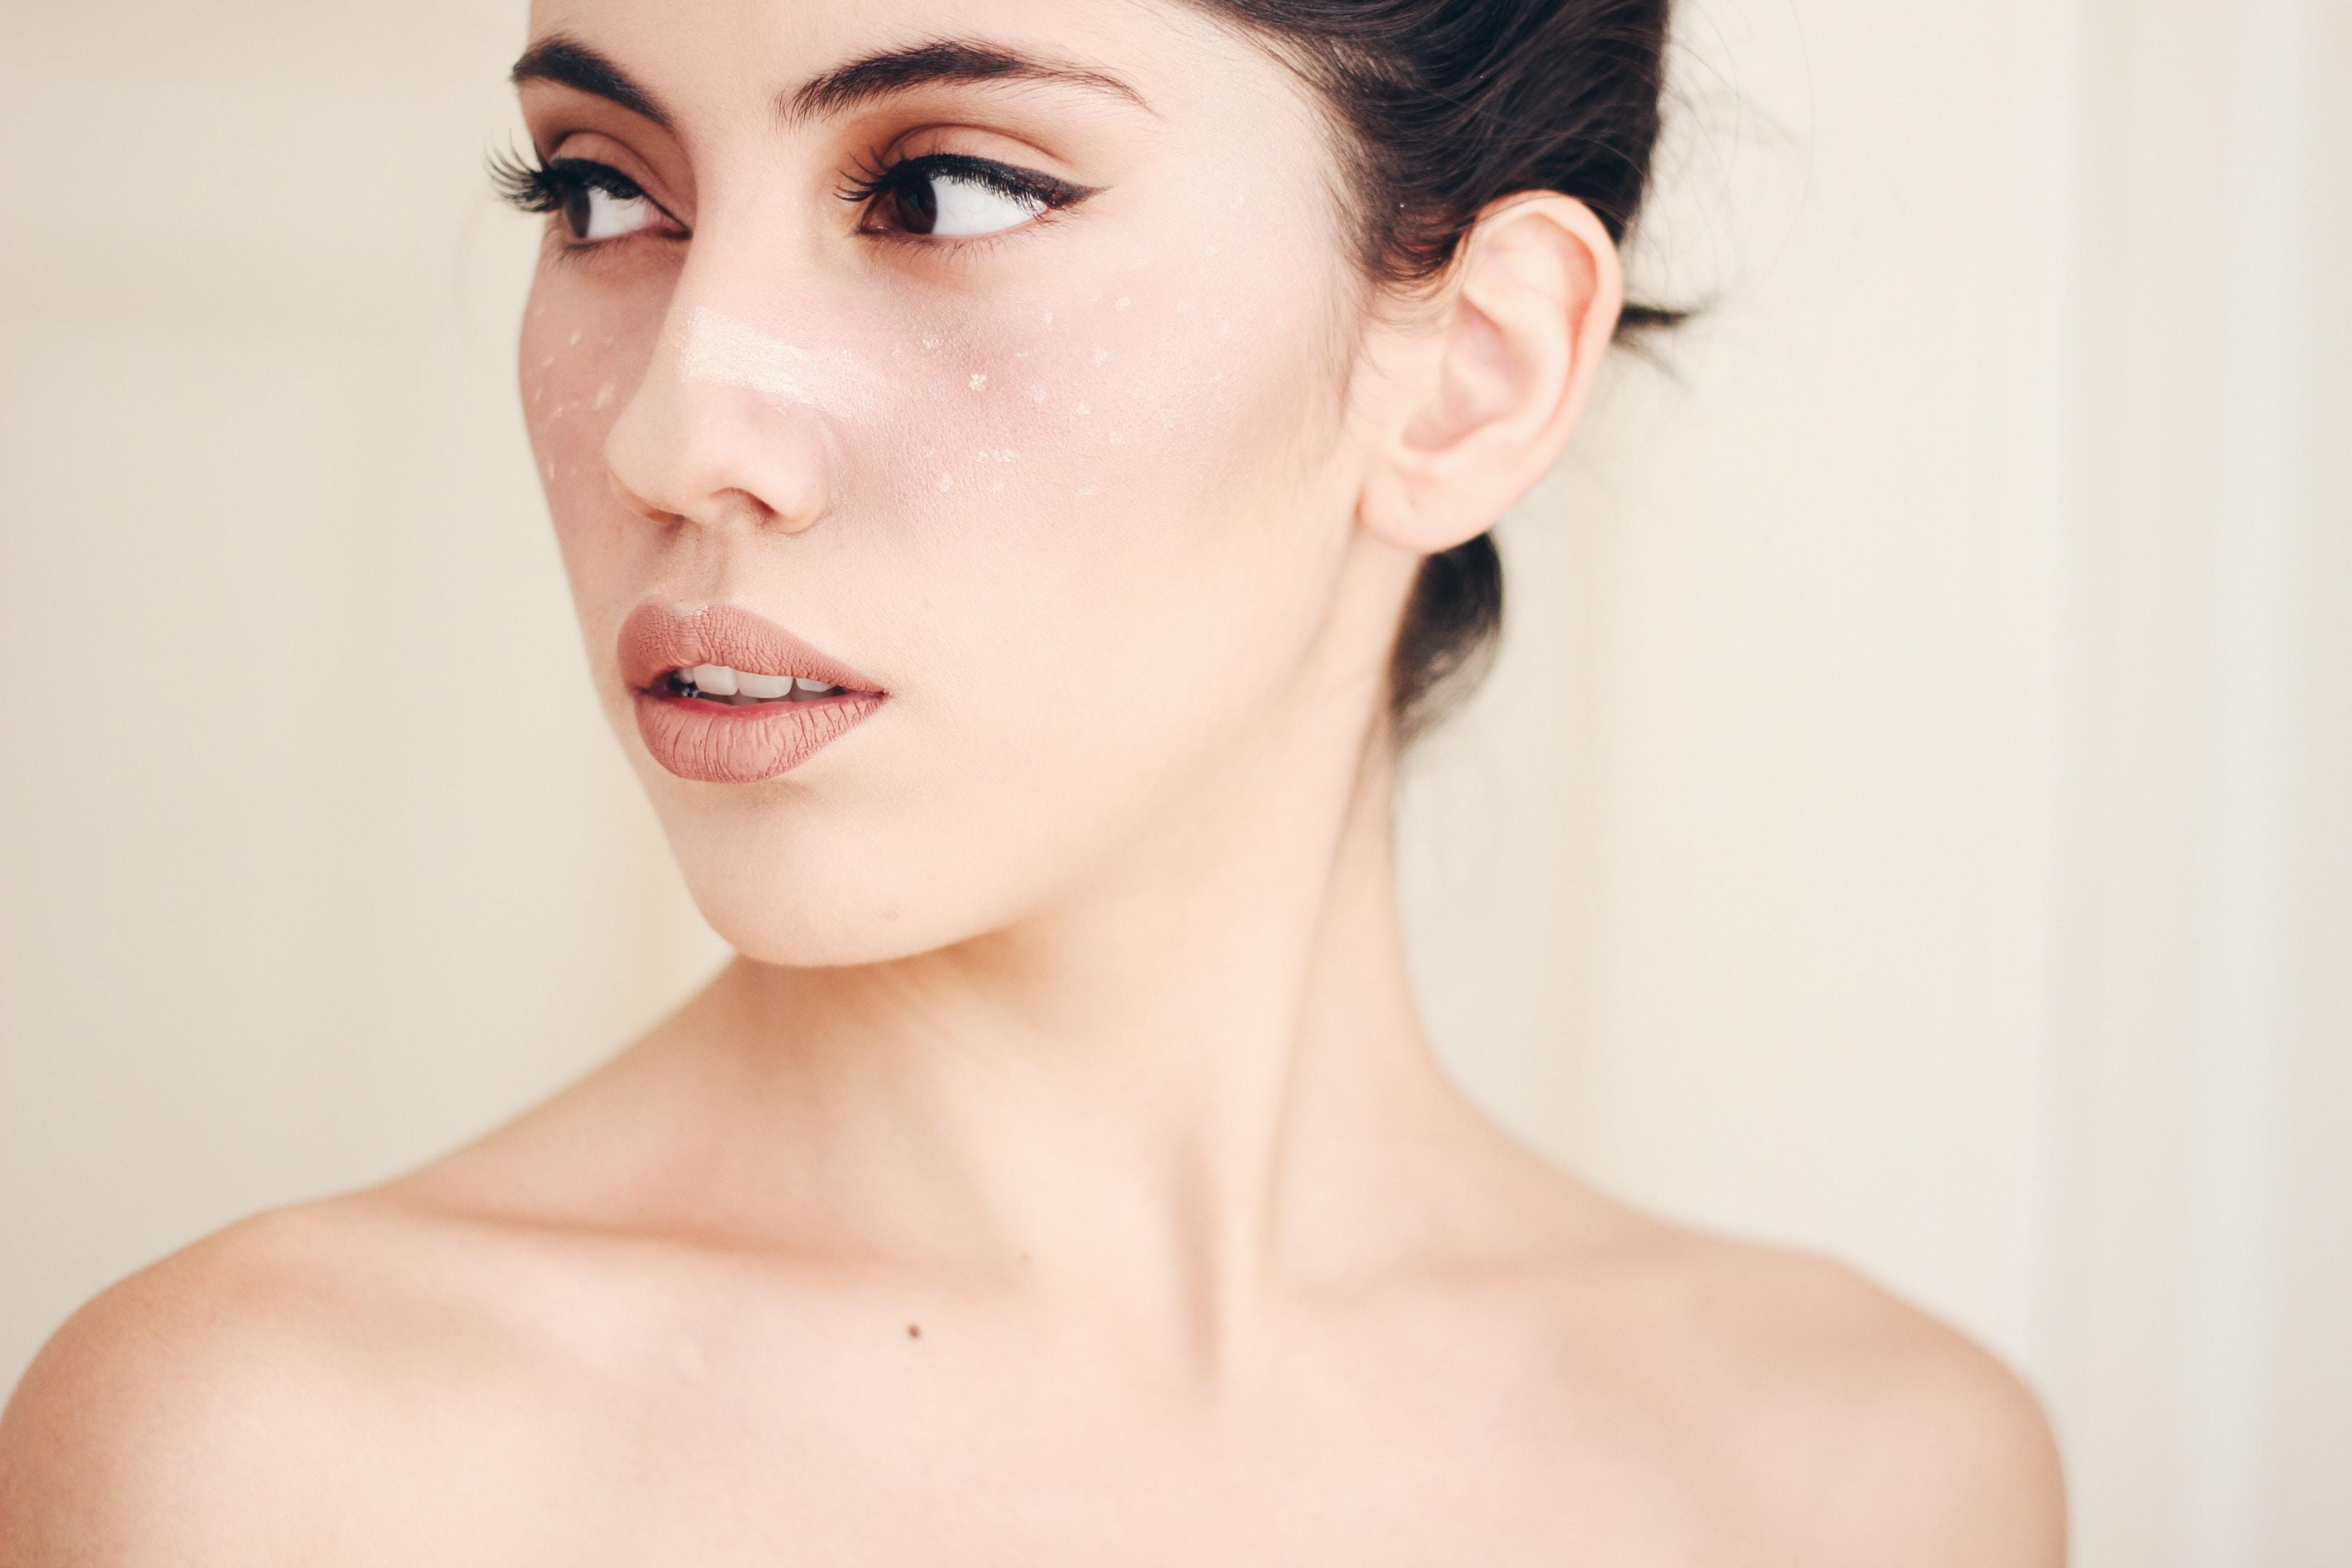 Go to Andrea Palacios's profile